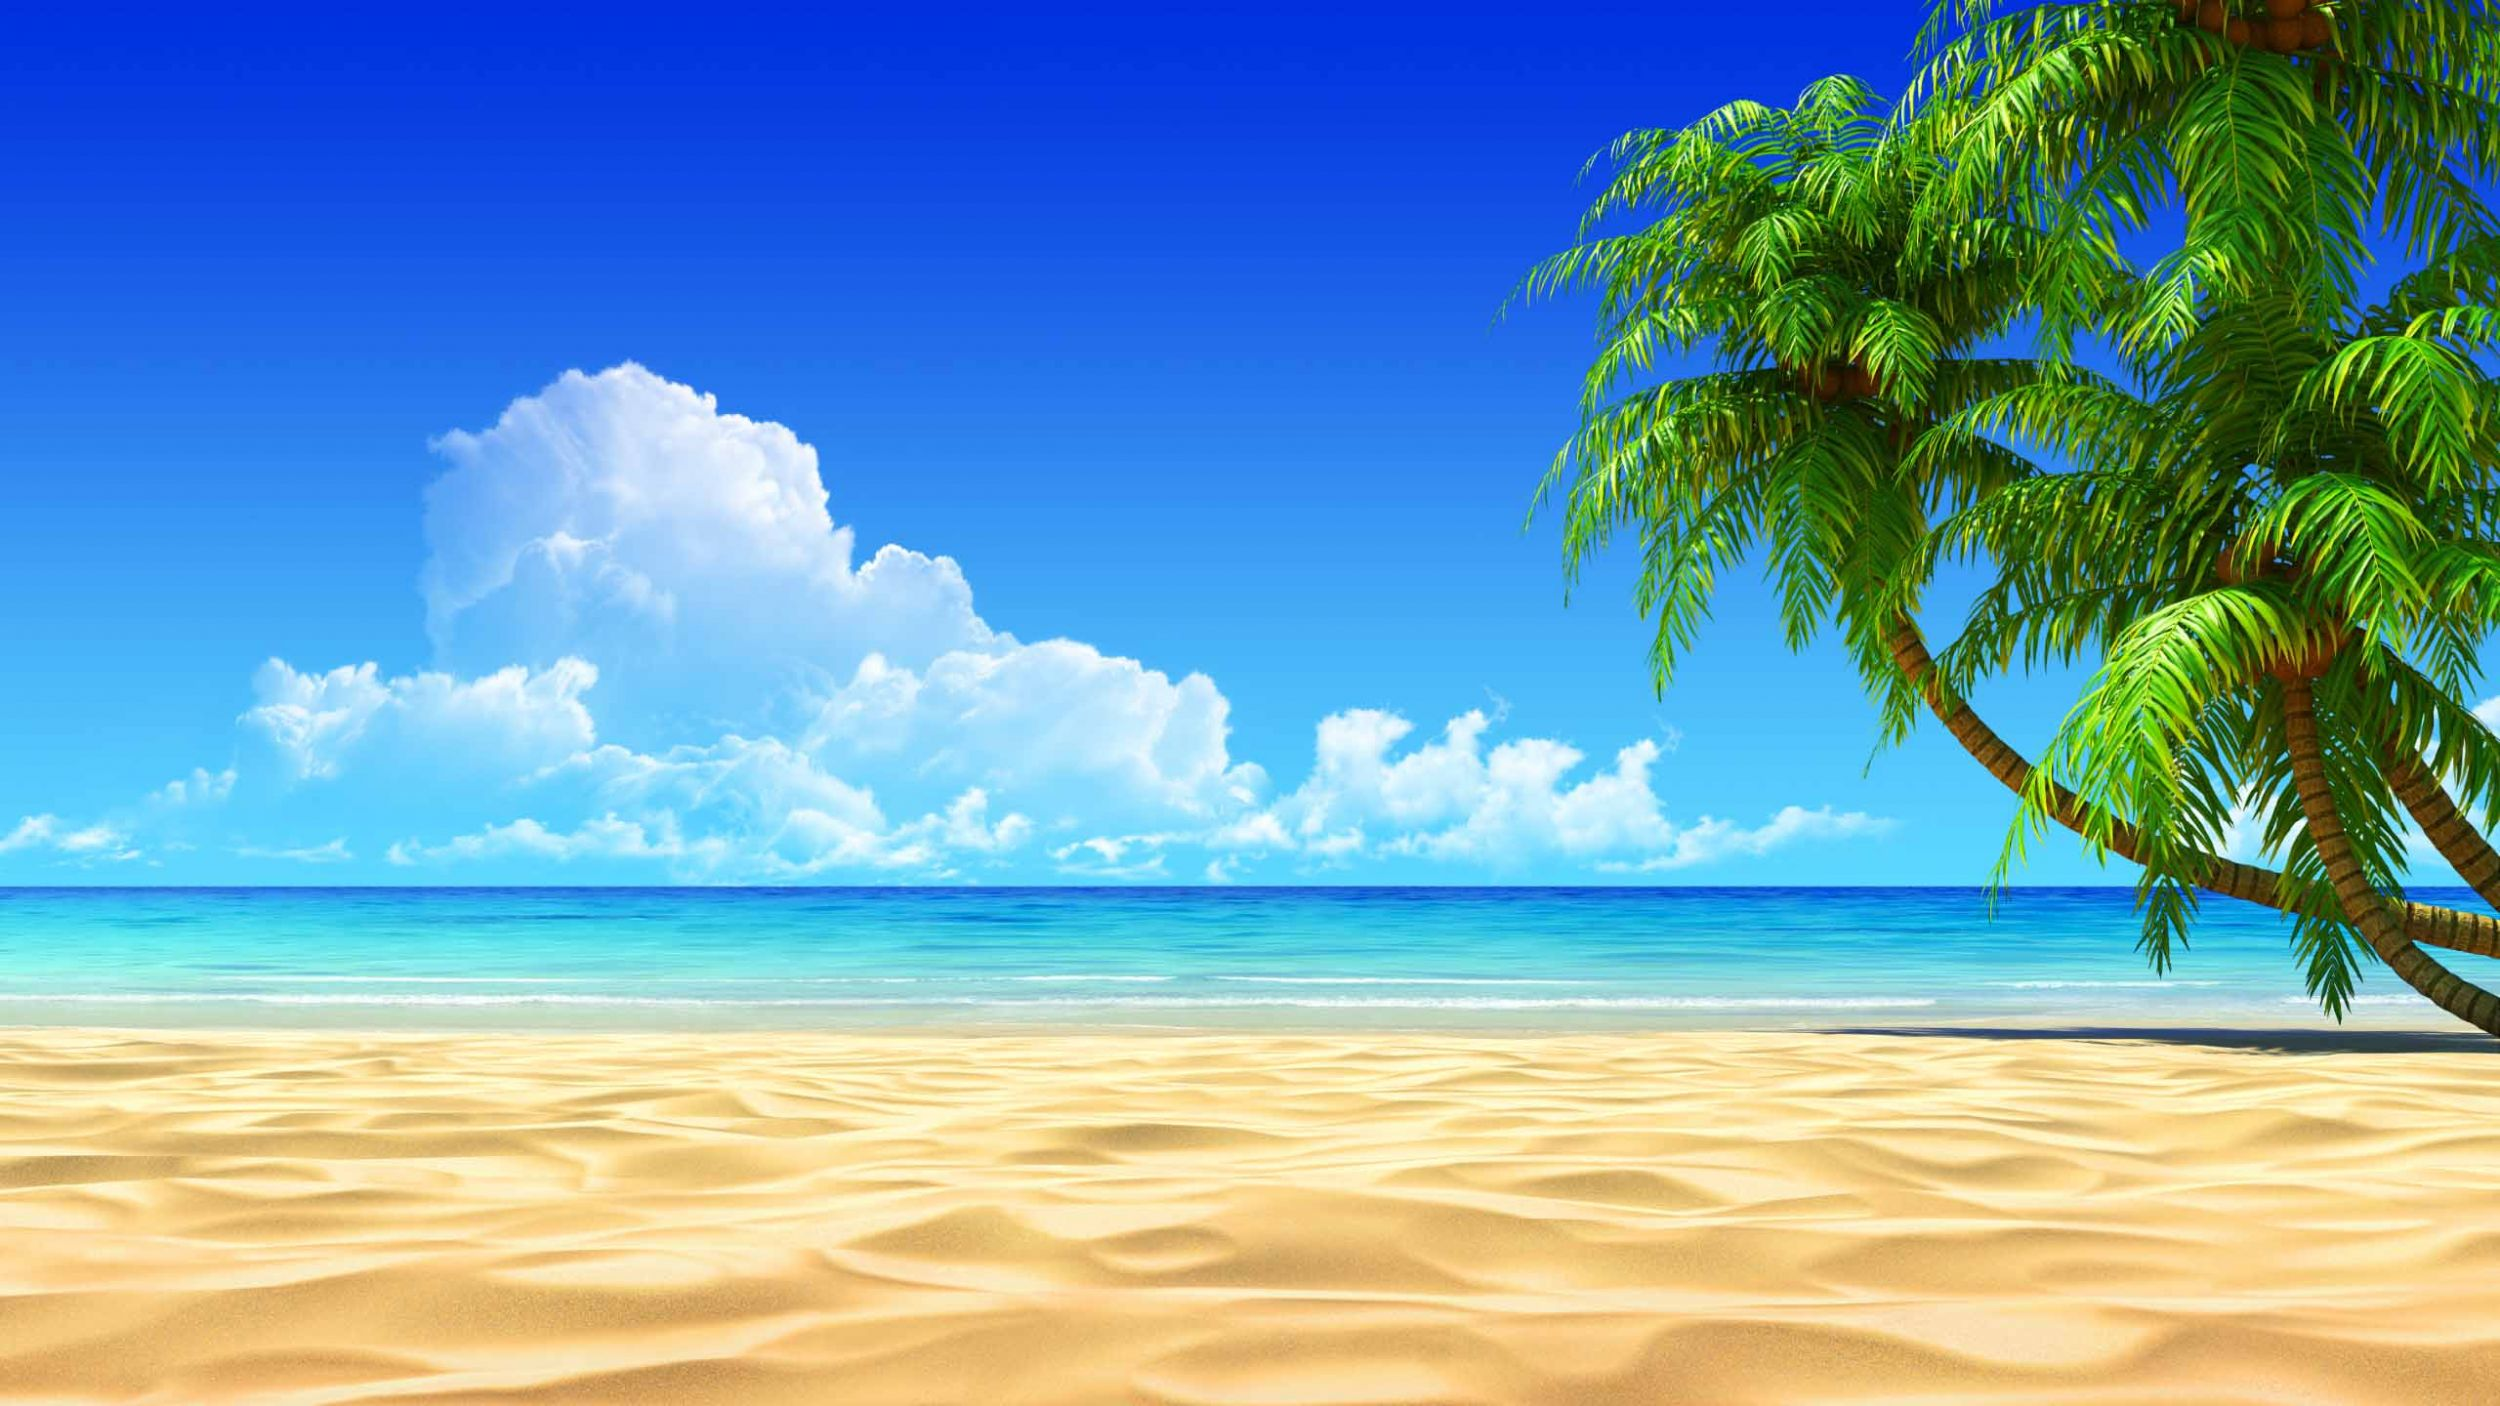 Beach Pics download best at digitalimagemakerworldcom chargeless 2500x1406